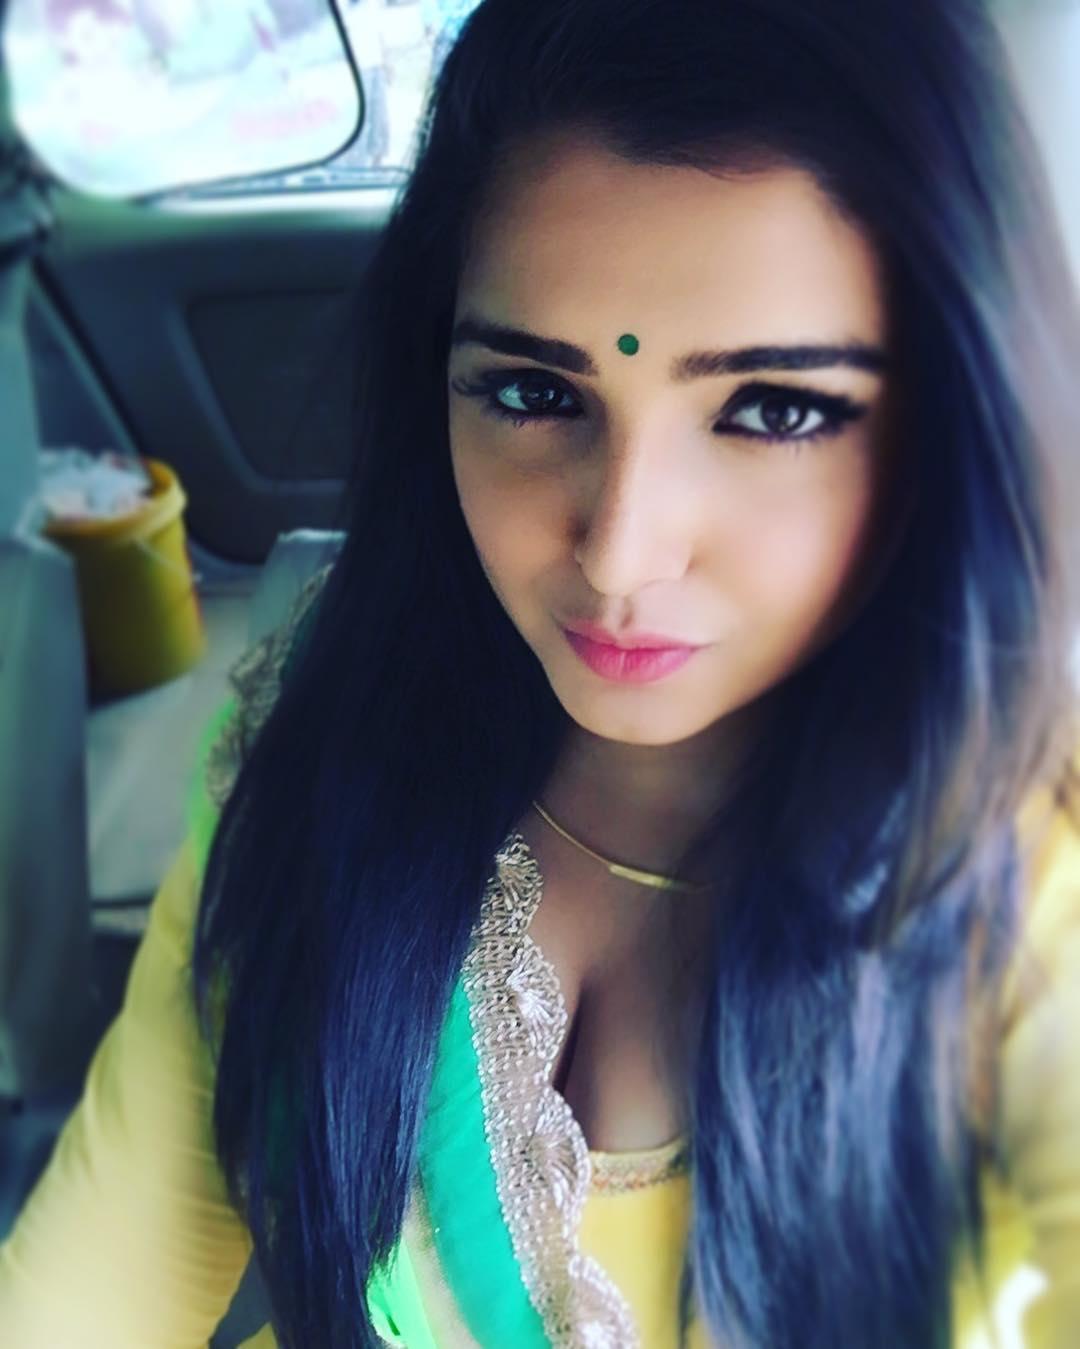 Amrapali Dubey Cleavage Photos Hot - Actress World-9897